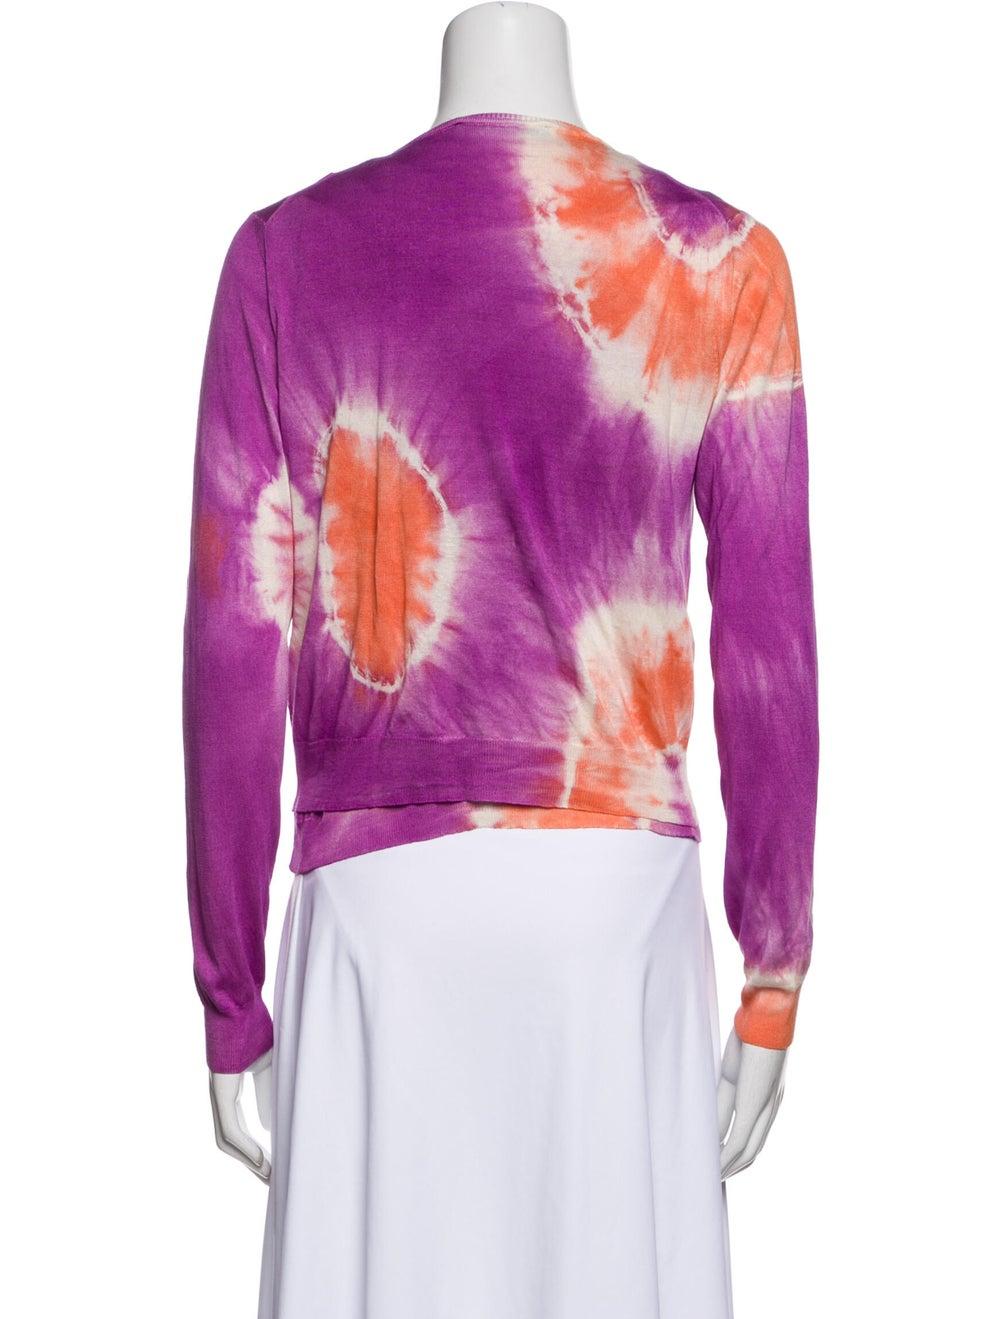 Blumarine Silk Tie-Dye Print Sweater Orange - image 3